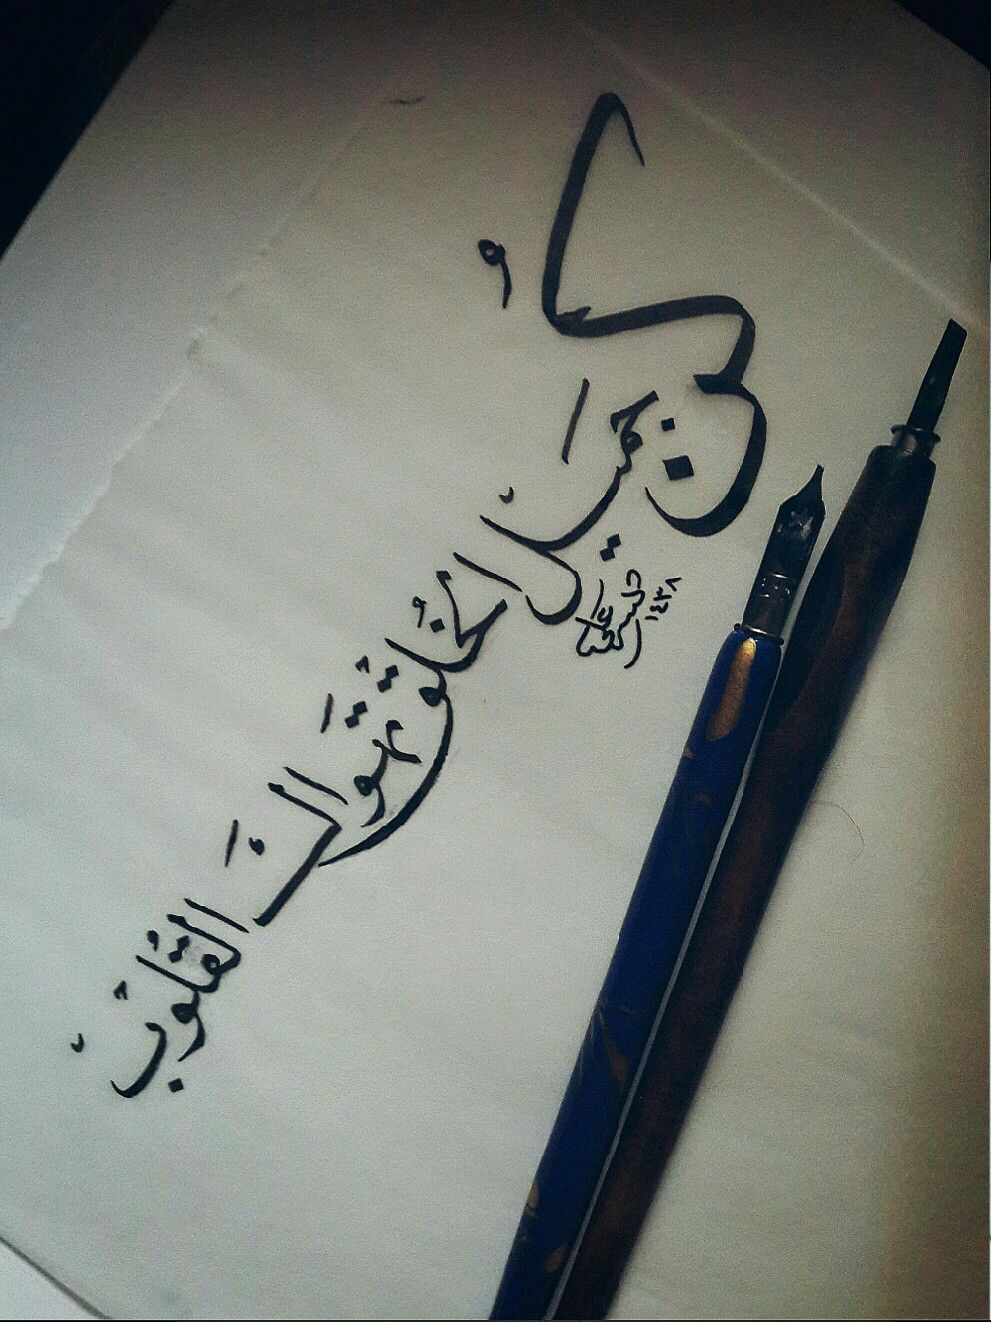 كن جميل الخ لق تهواك القلوب خطي نسخ Proverbs Quotes Quotes For Book Lovers Beautiful Arabic Words